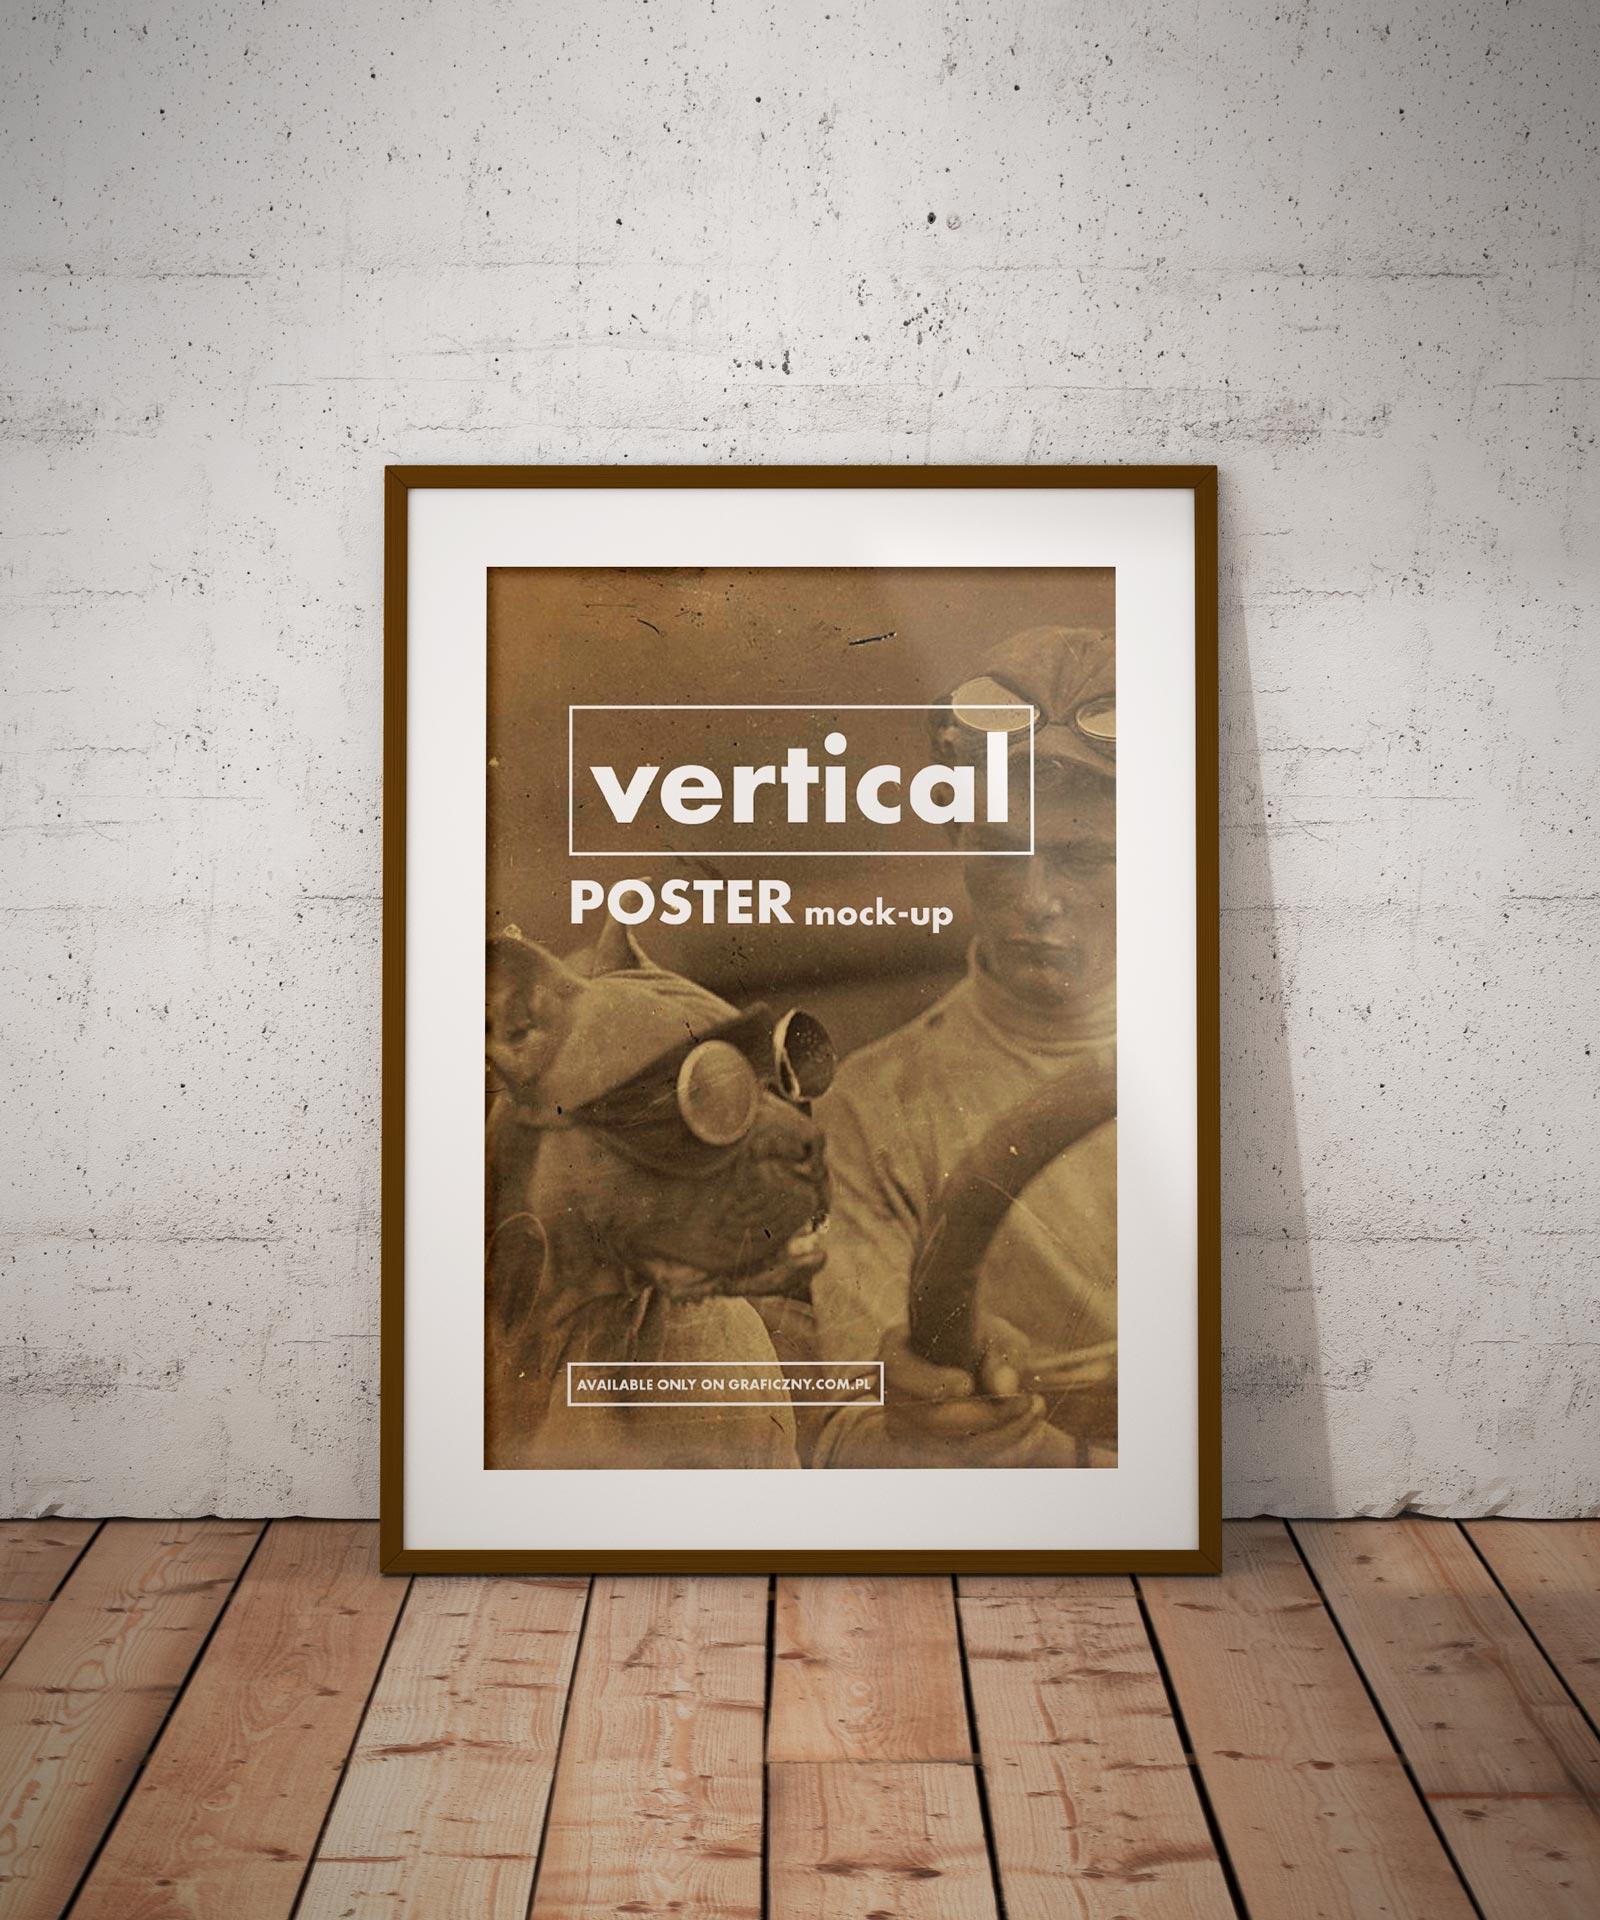 Free-Vertical-Photo-Frame-Mockup-PSD-Files-2